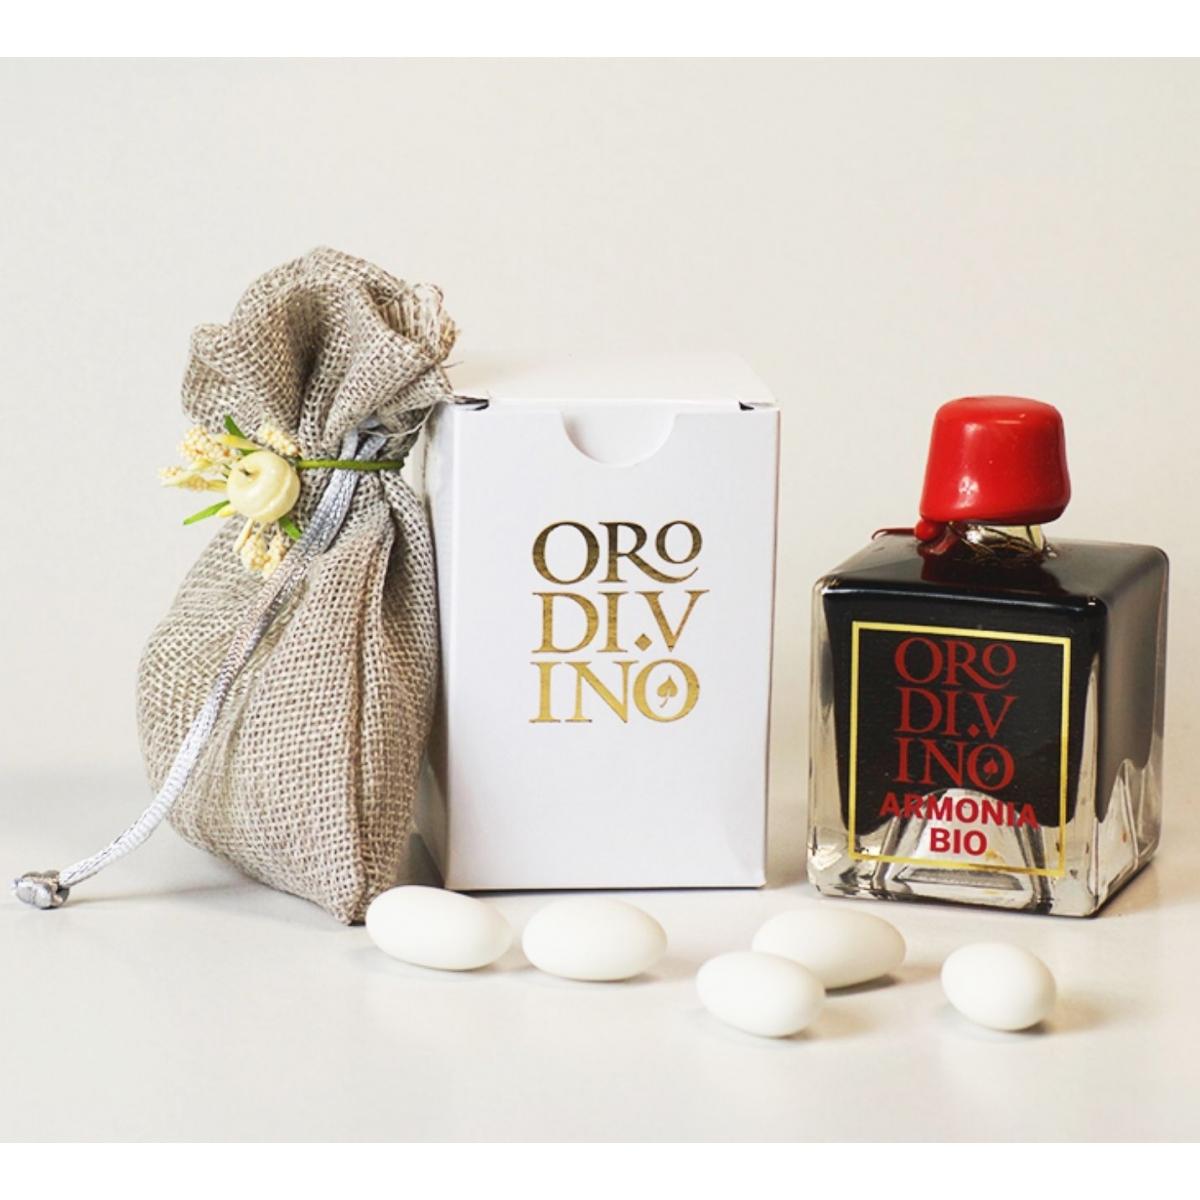 Wedding Favors Food: Wedding Favor Food, Balsamic Vinegar Modena